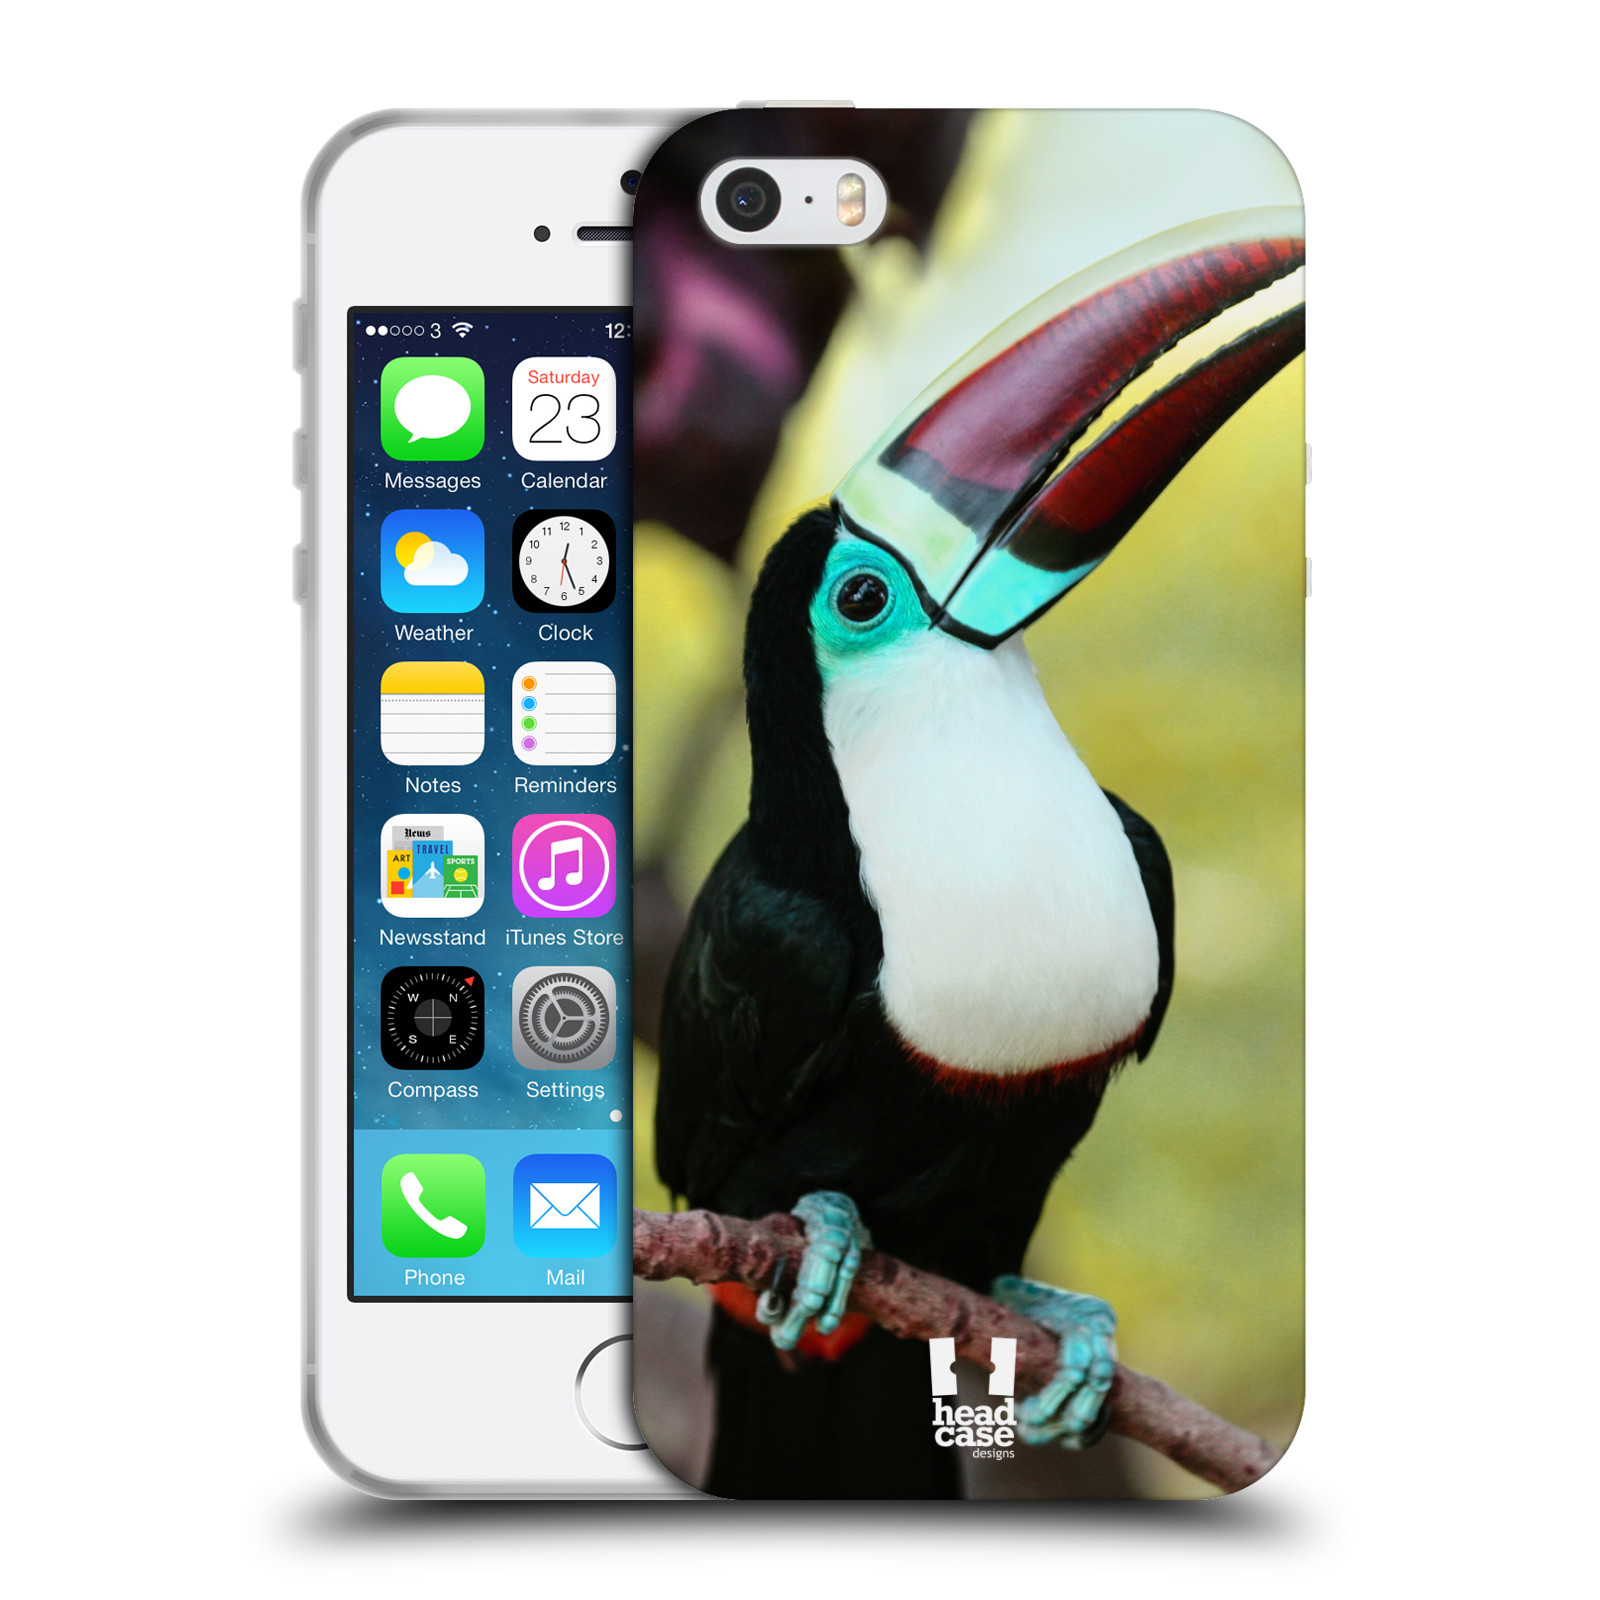 HEAD CASE silikonový obal na mobil Apple Iphone 5/5S vzor slavná zvířata foto tukan